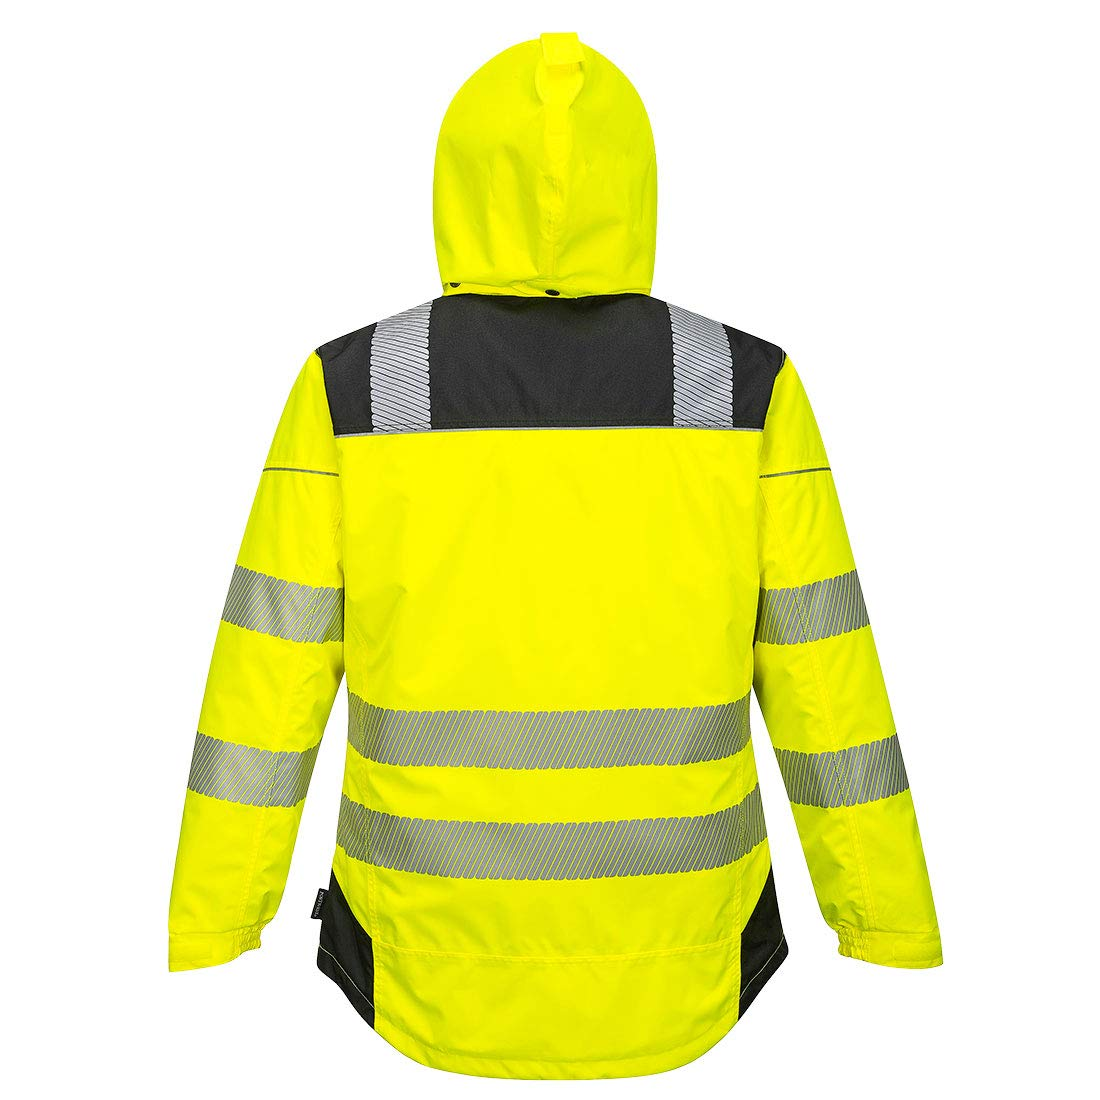 Portwest PW3 Hi-Vis Winter Jacket Work Safety Protective Reflective Waterproof Coat ANSI 3, XXL by Portwest (Image #4)